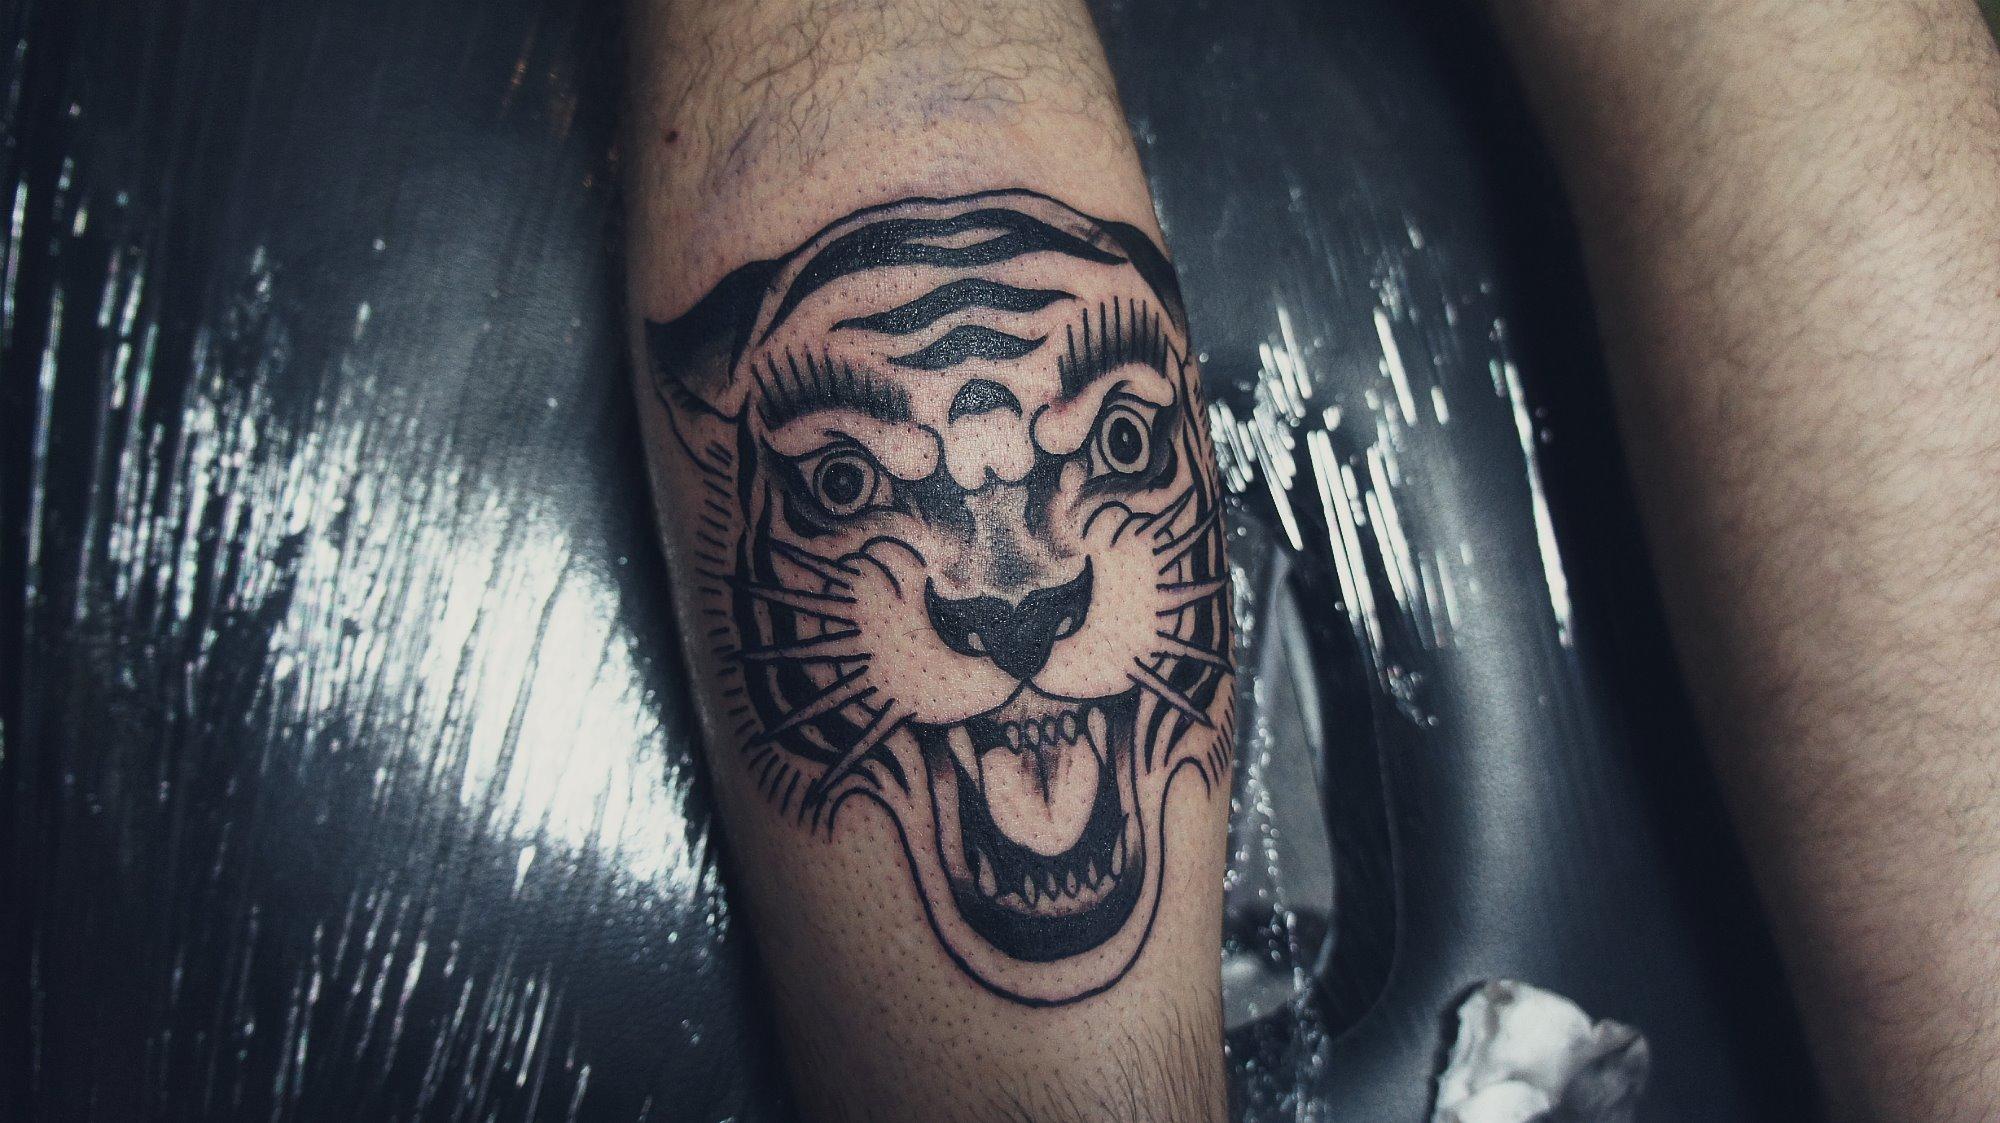 Inksearch tattoo Victor Vasilkov